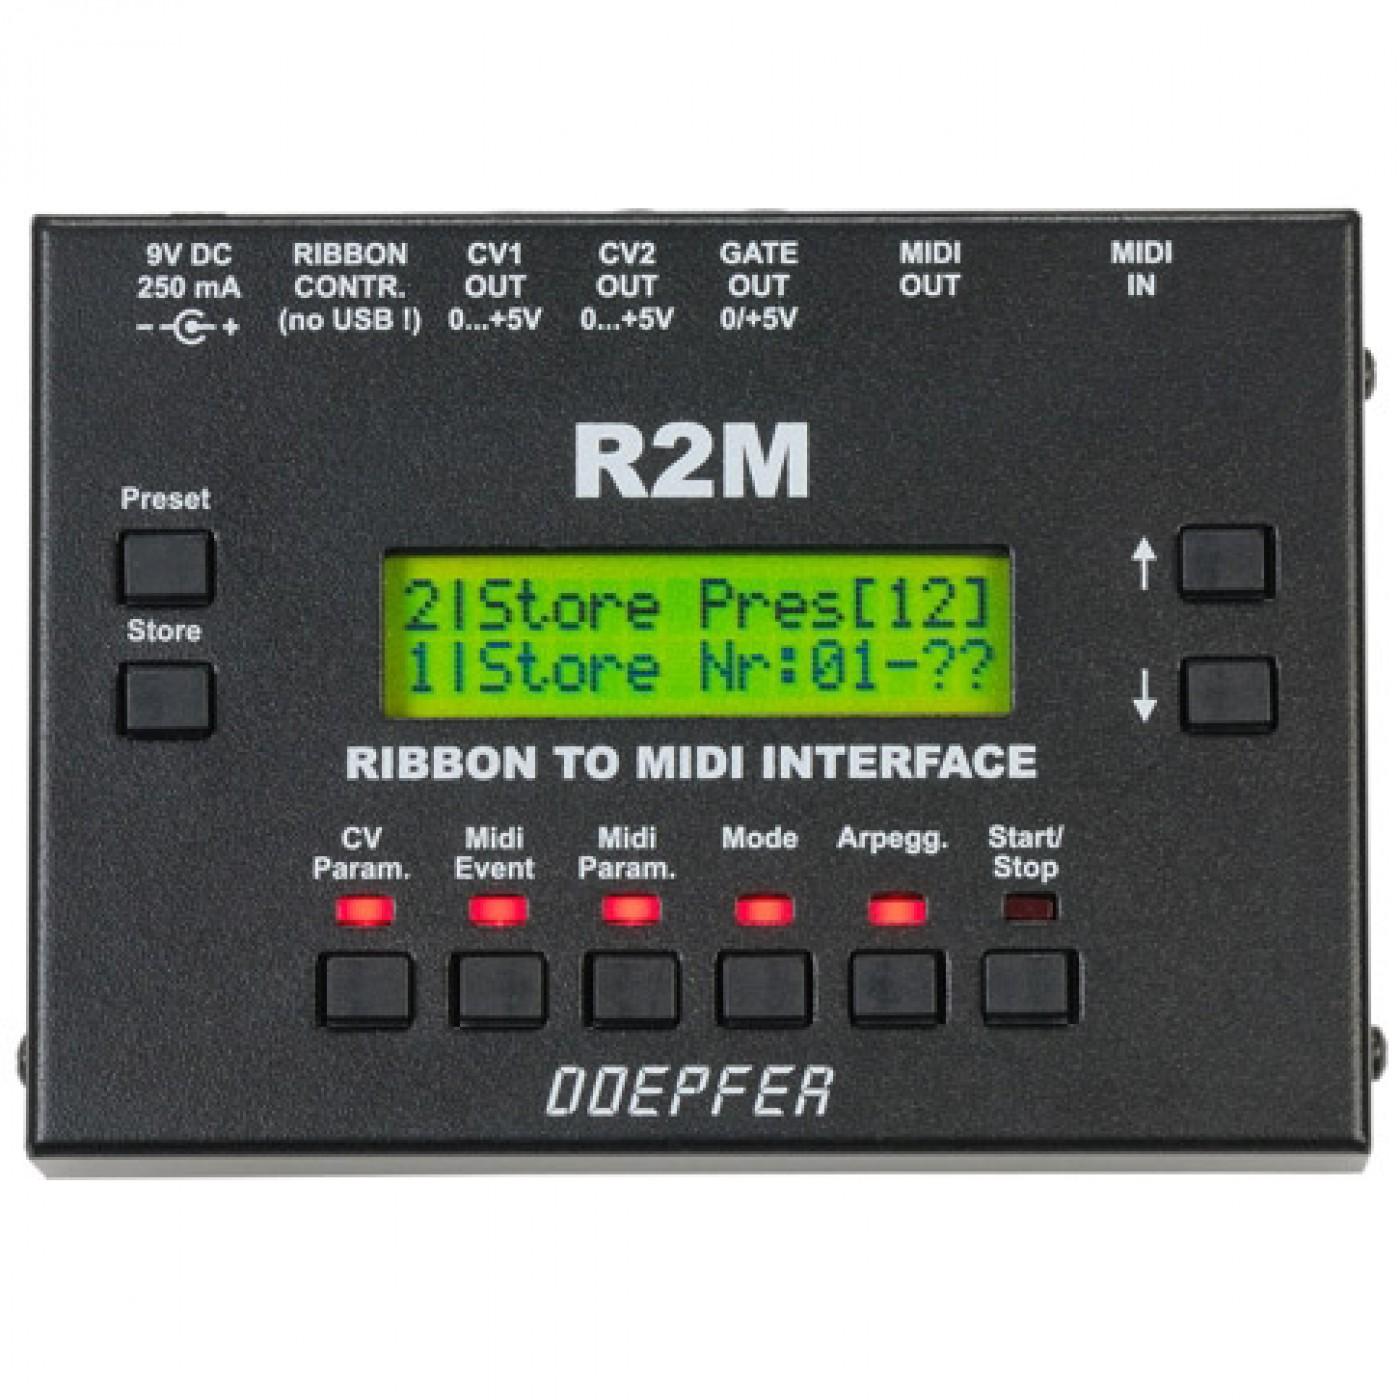 Doepfer R2M V2 MIDI Ribbon Controller